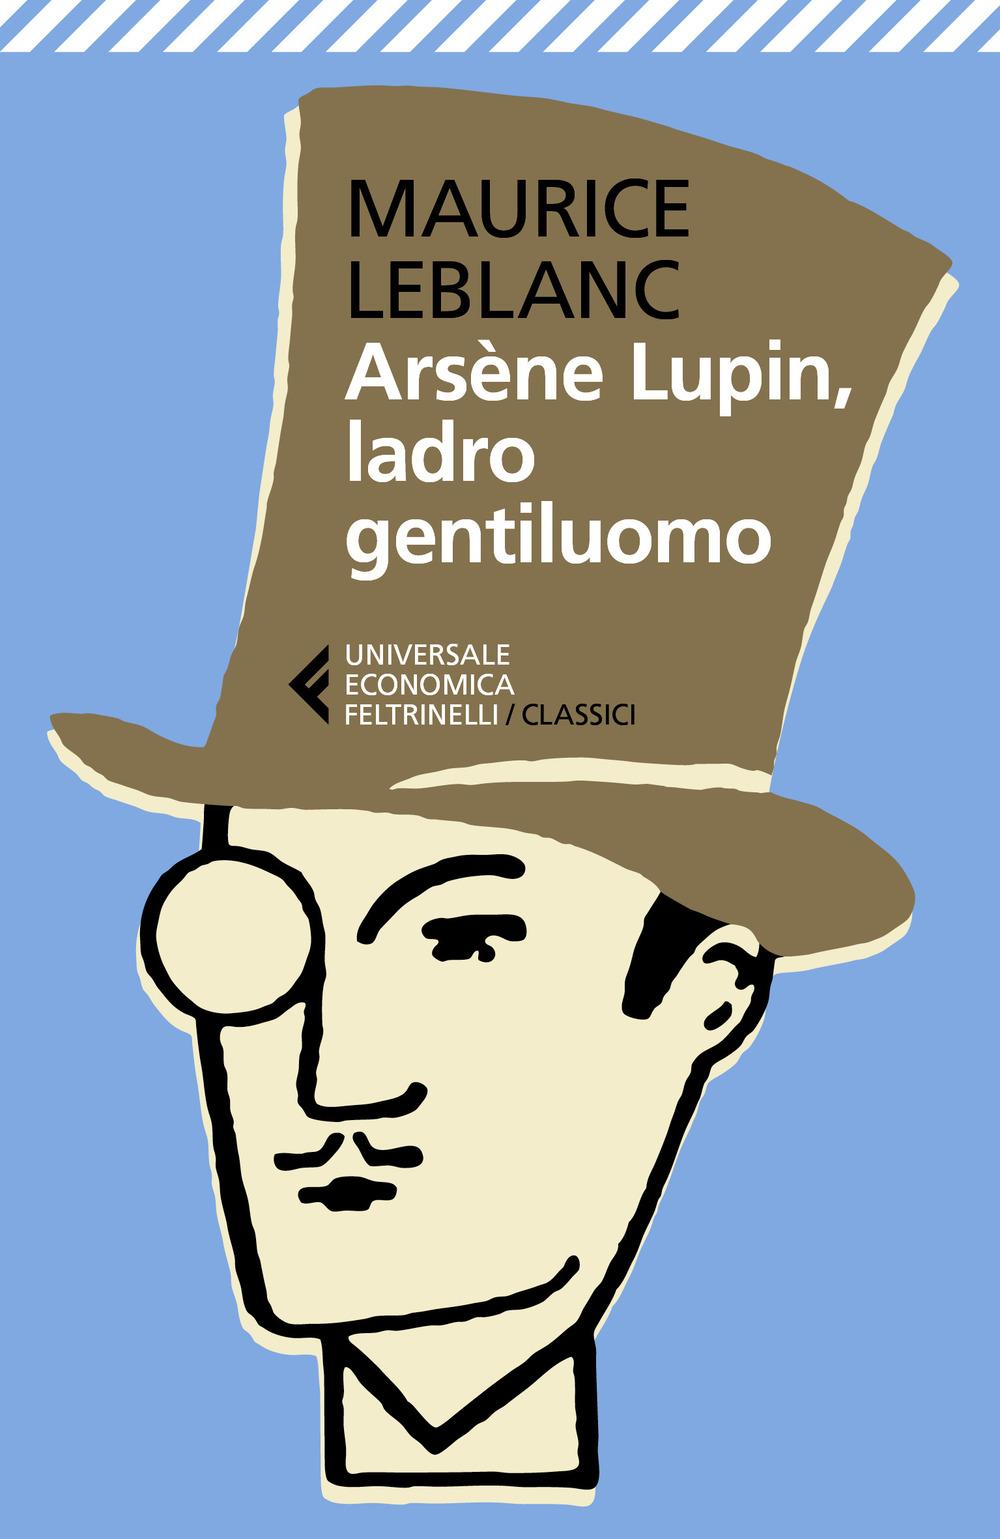 Image of Arsène Lupin, ladro gentiluomo